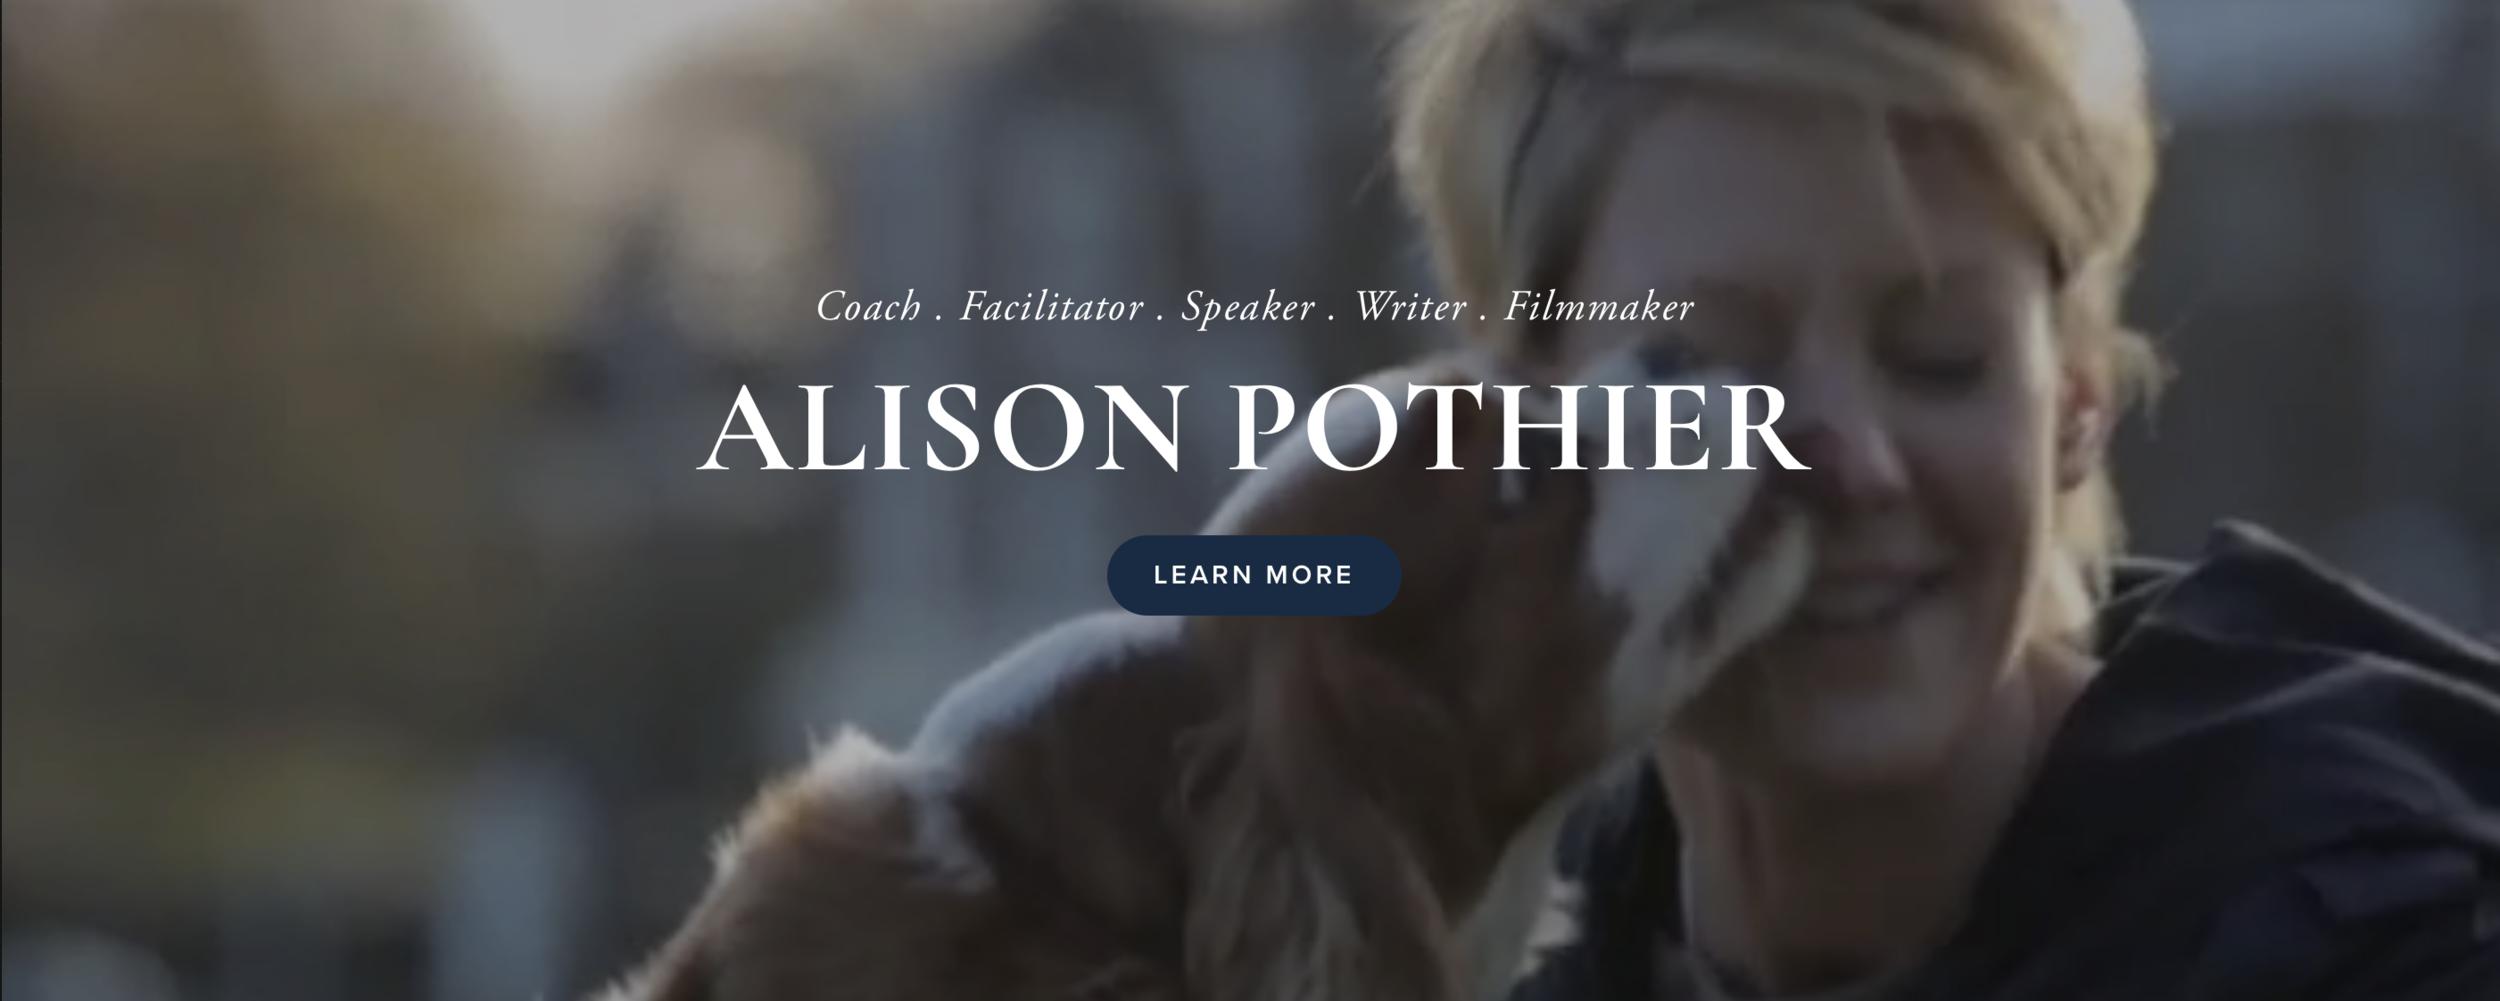 AlisonPothier.png